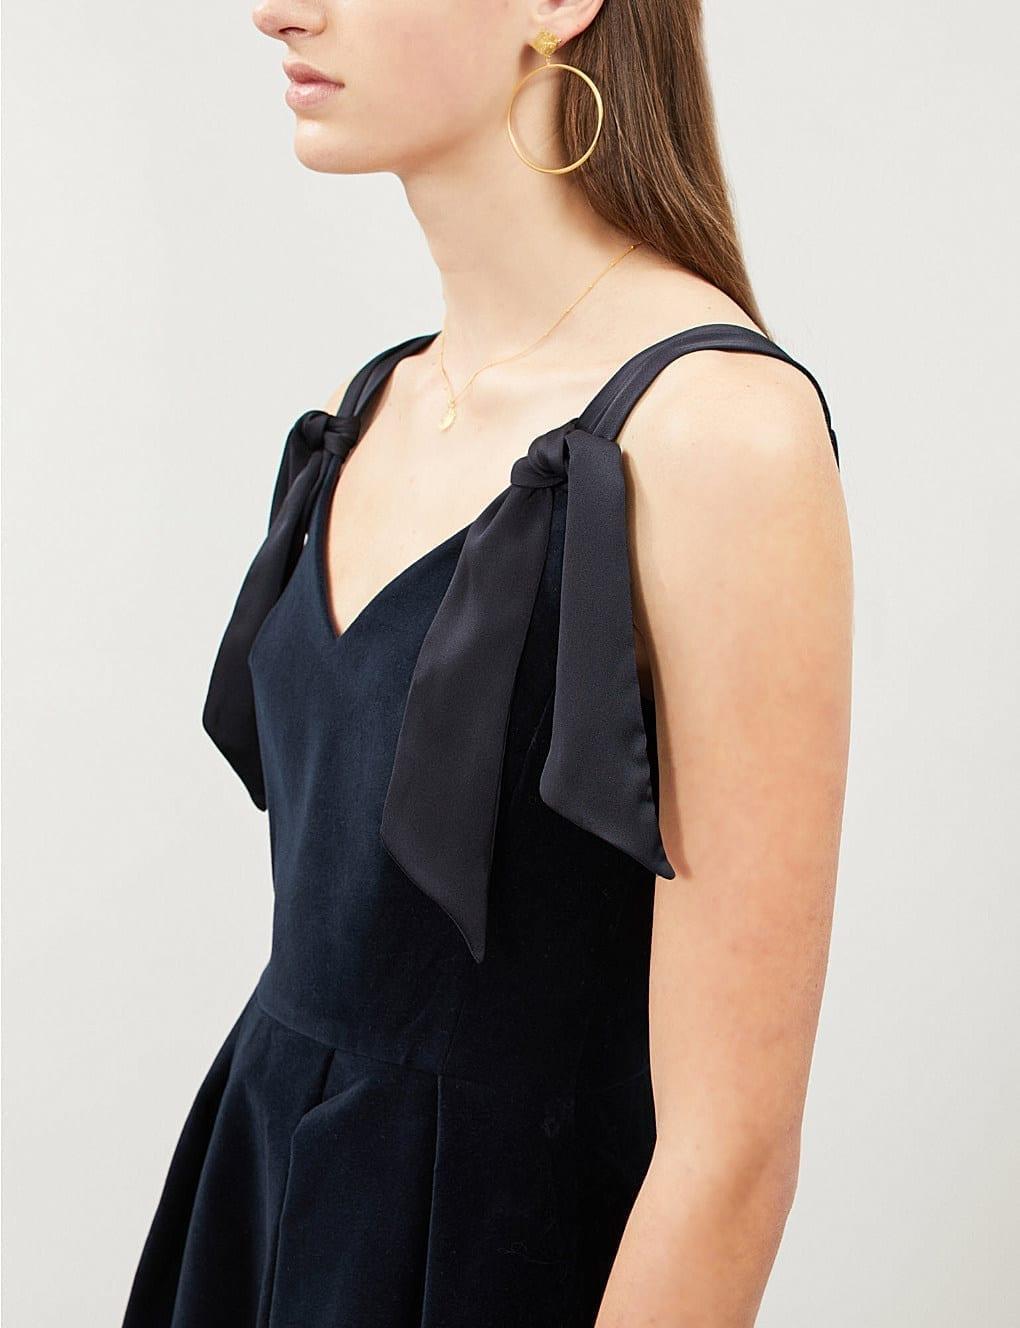 Select Velvet Tie Dress We Pierlot Rimy Claudie Navy Dresses qCnw7x0W